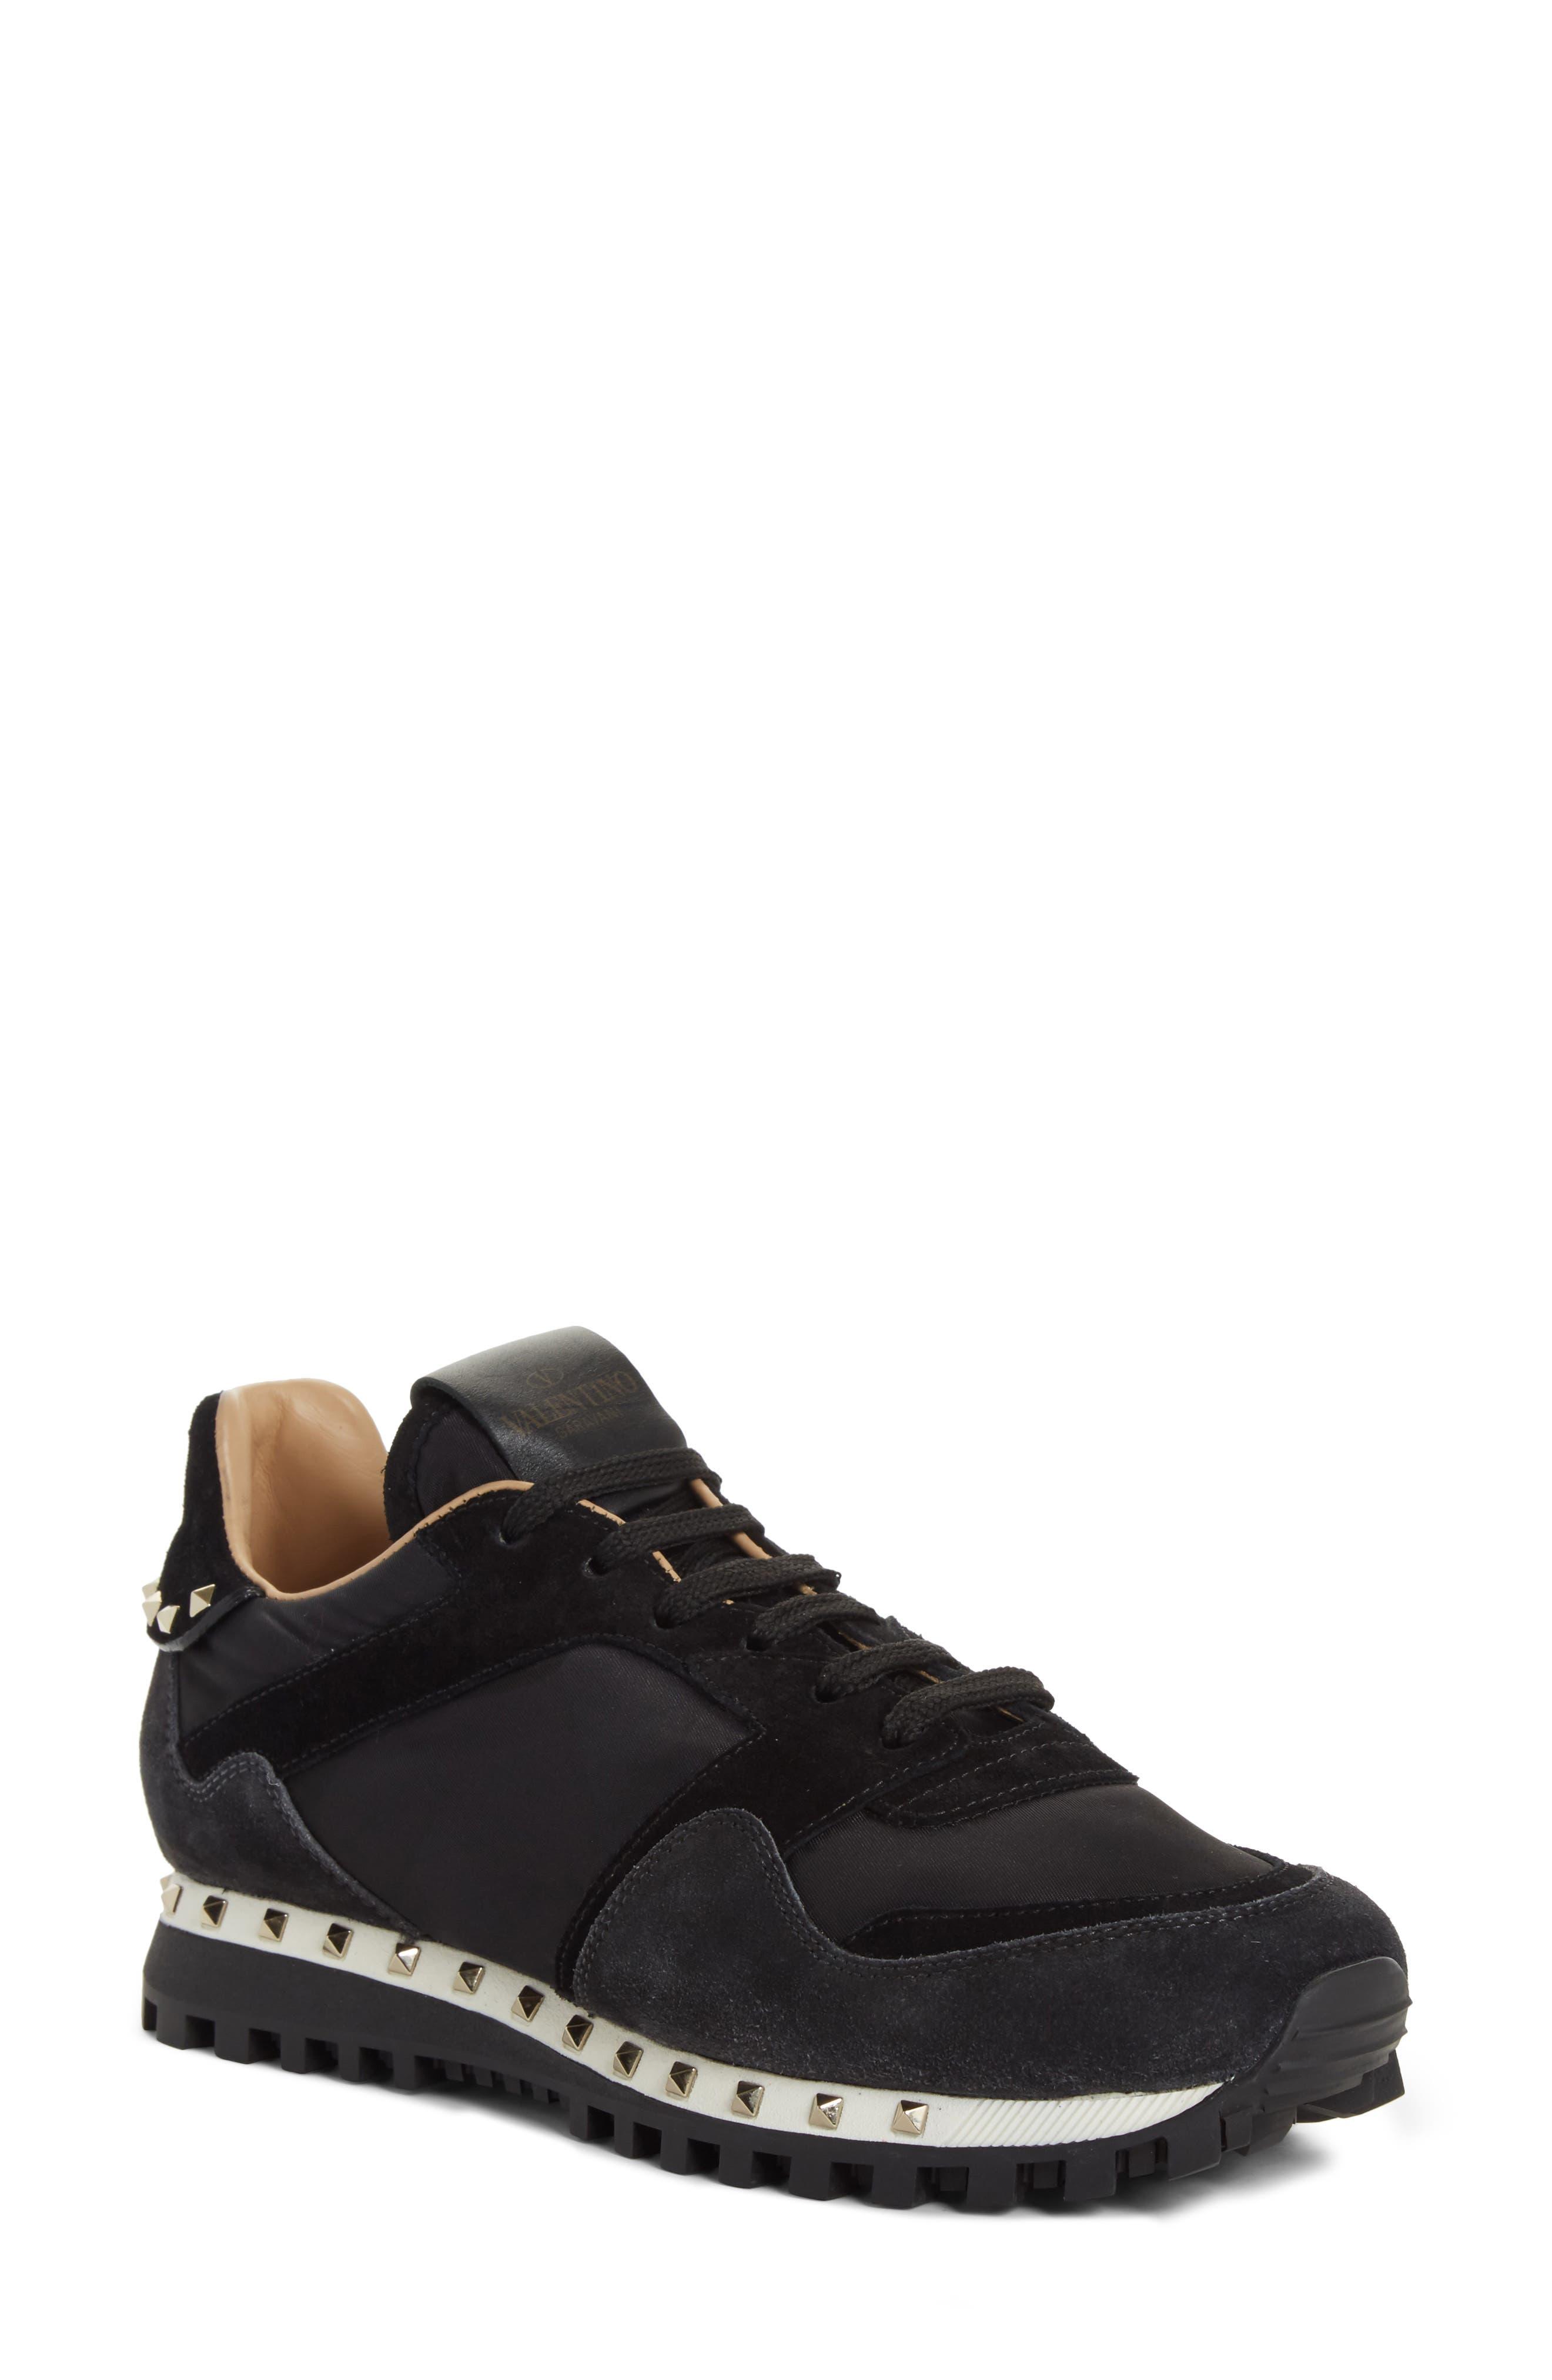 Rockstud Sneaker,                             Main thumbnail 1, color,                             BLACK/ GREY